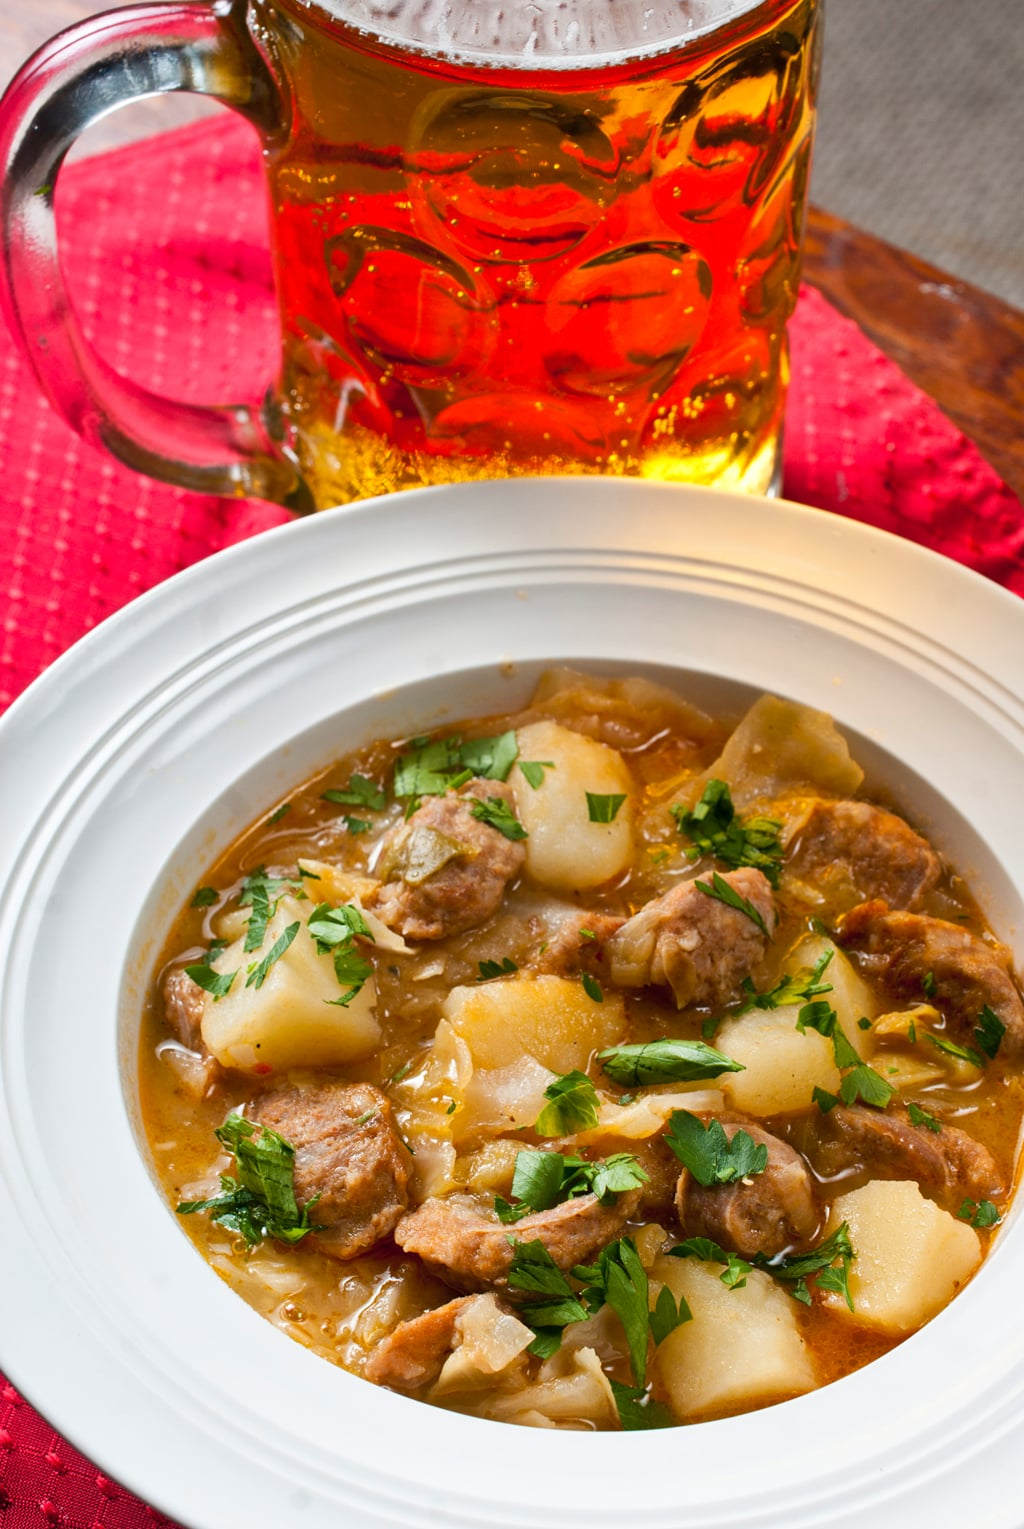 Beer and Bratwurst Stew